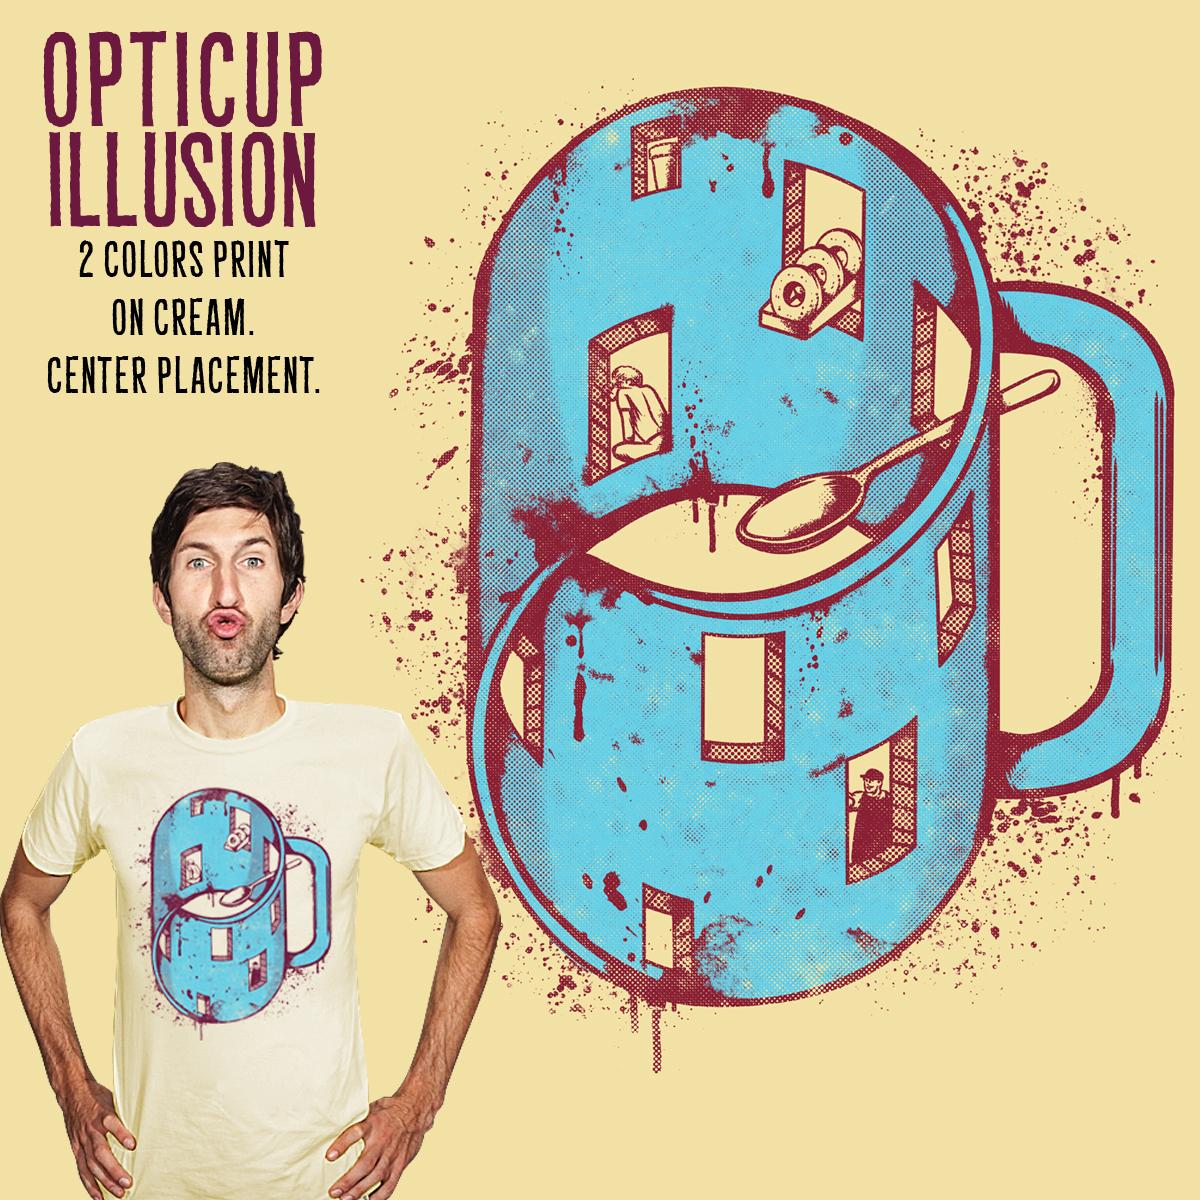 OptiCup Illusion by adam antium on Threadless